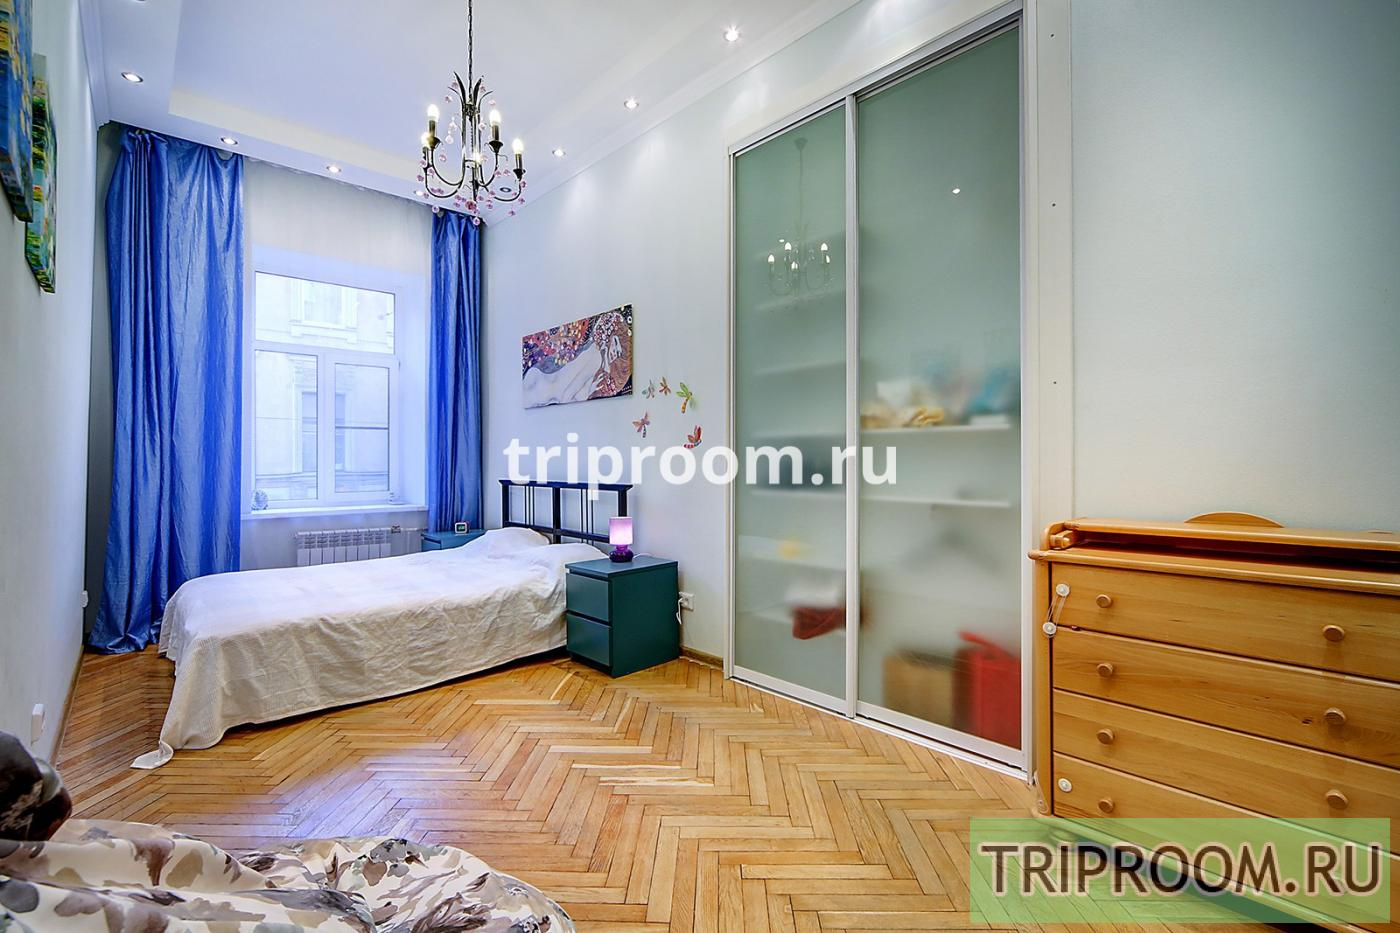 2-комнатная квартира посуточно (вариант № 15426), ул. Лиговский проспект, фото № 12